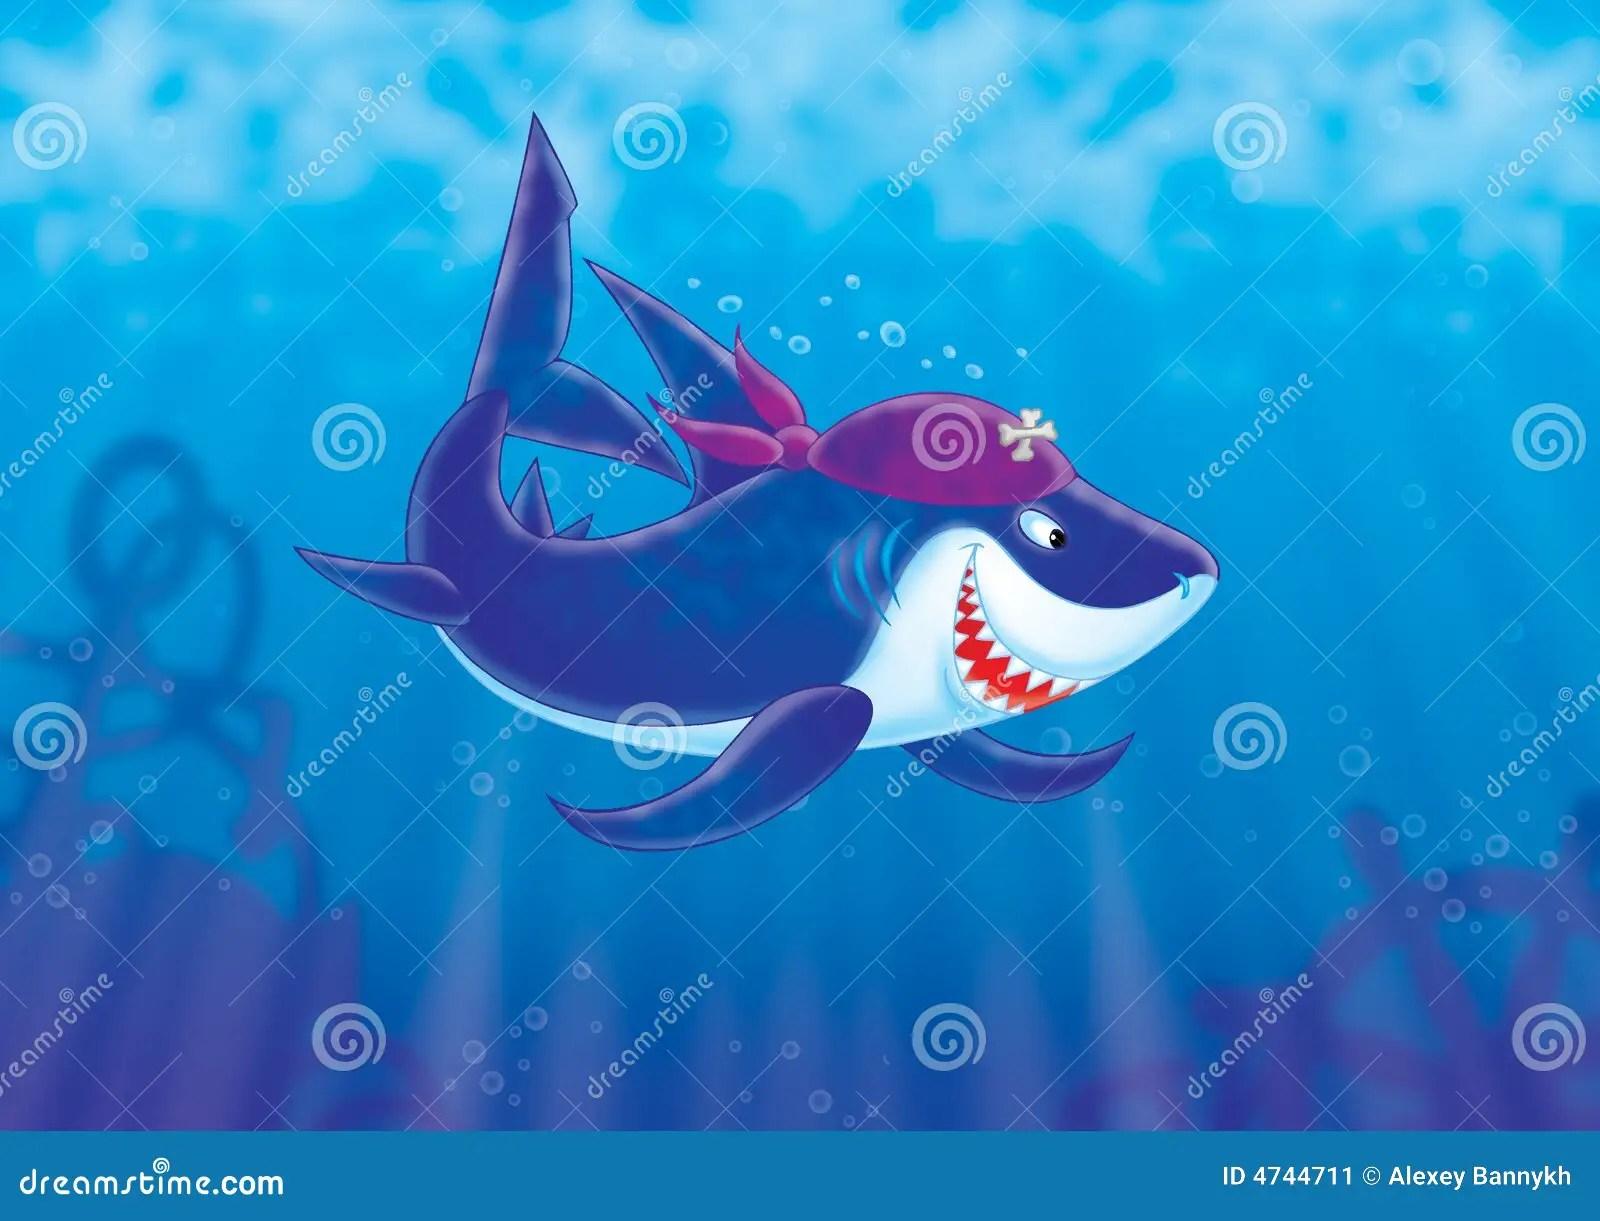 Exotic Animal Wallpaper Shark Pirate Stock Image Image 4744711